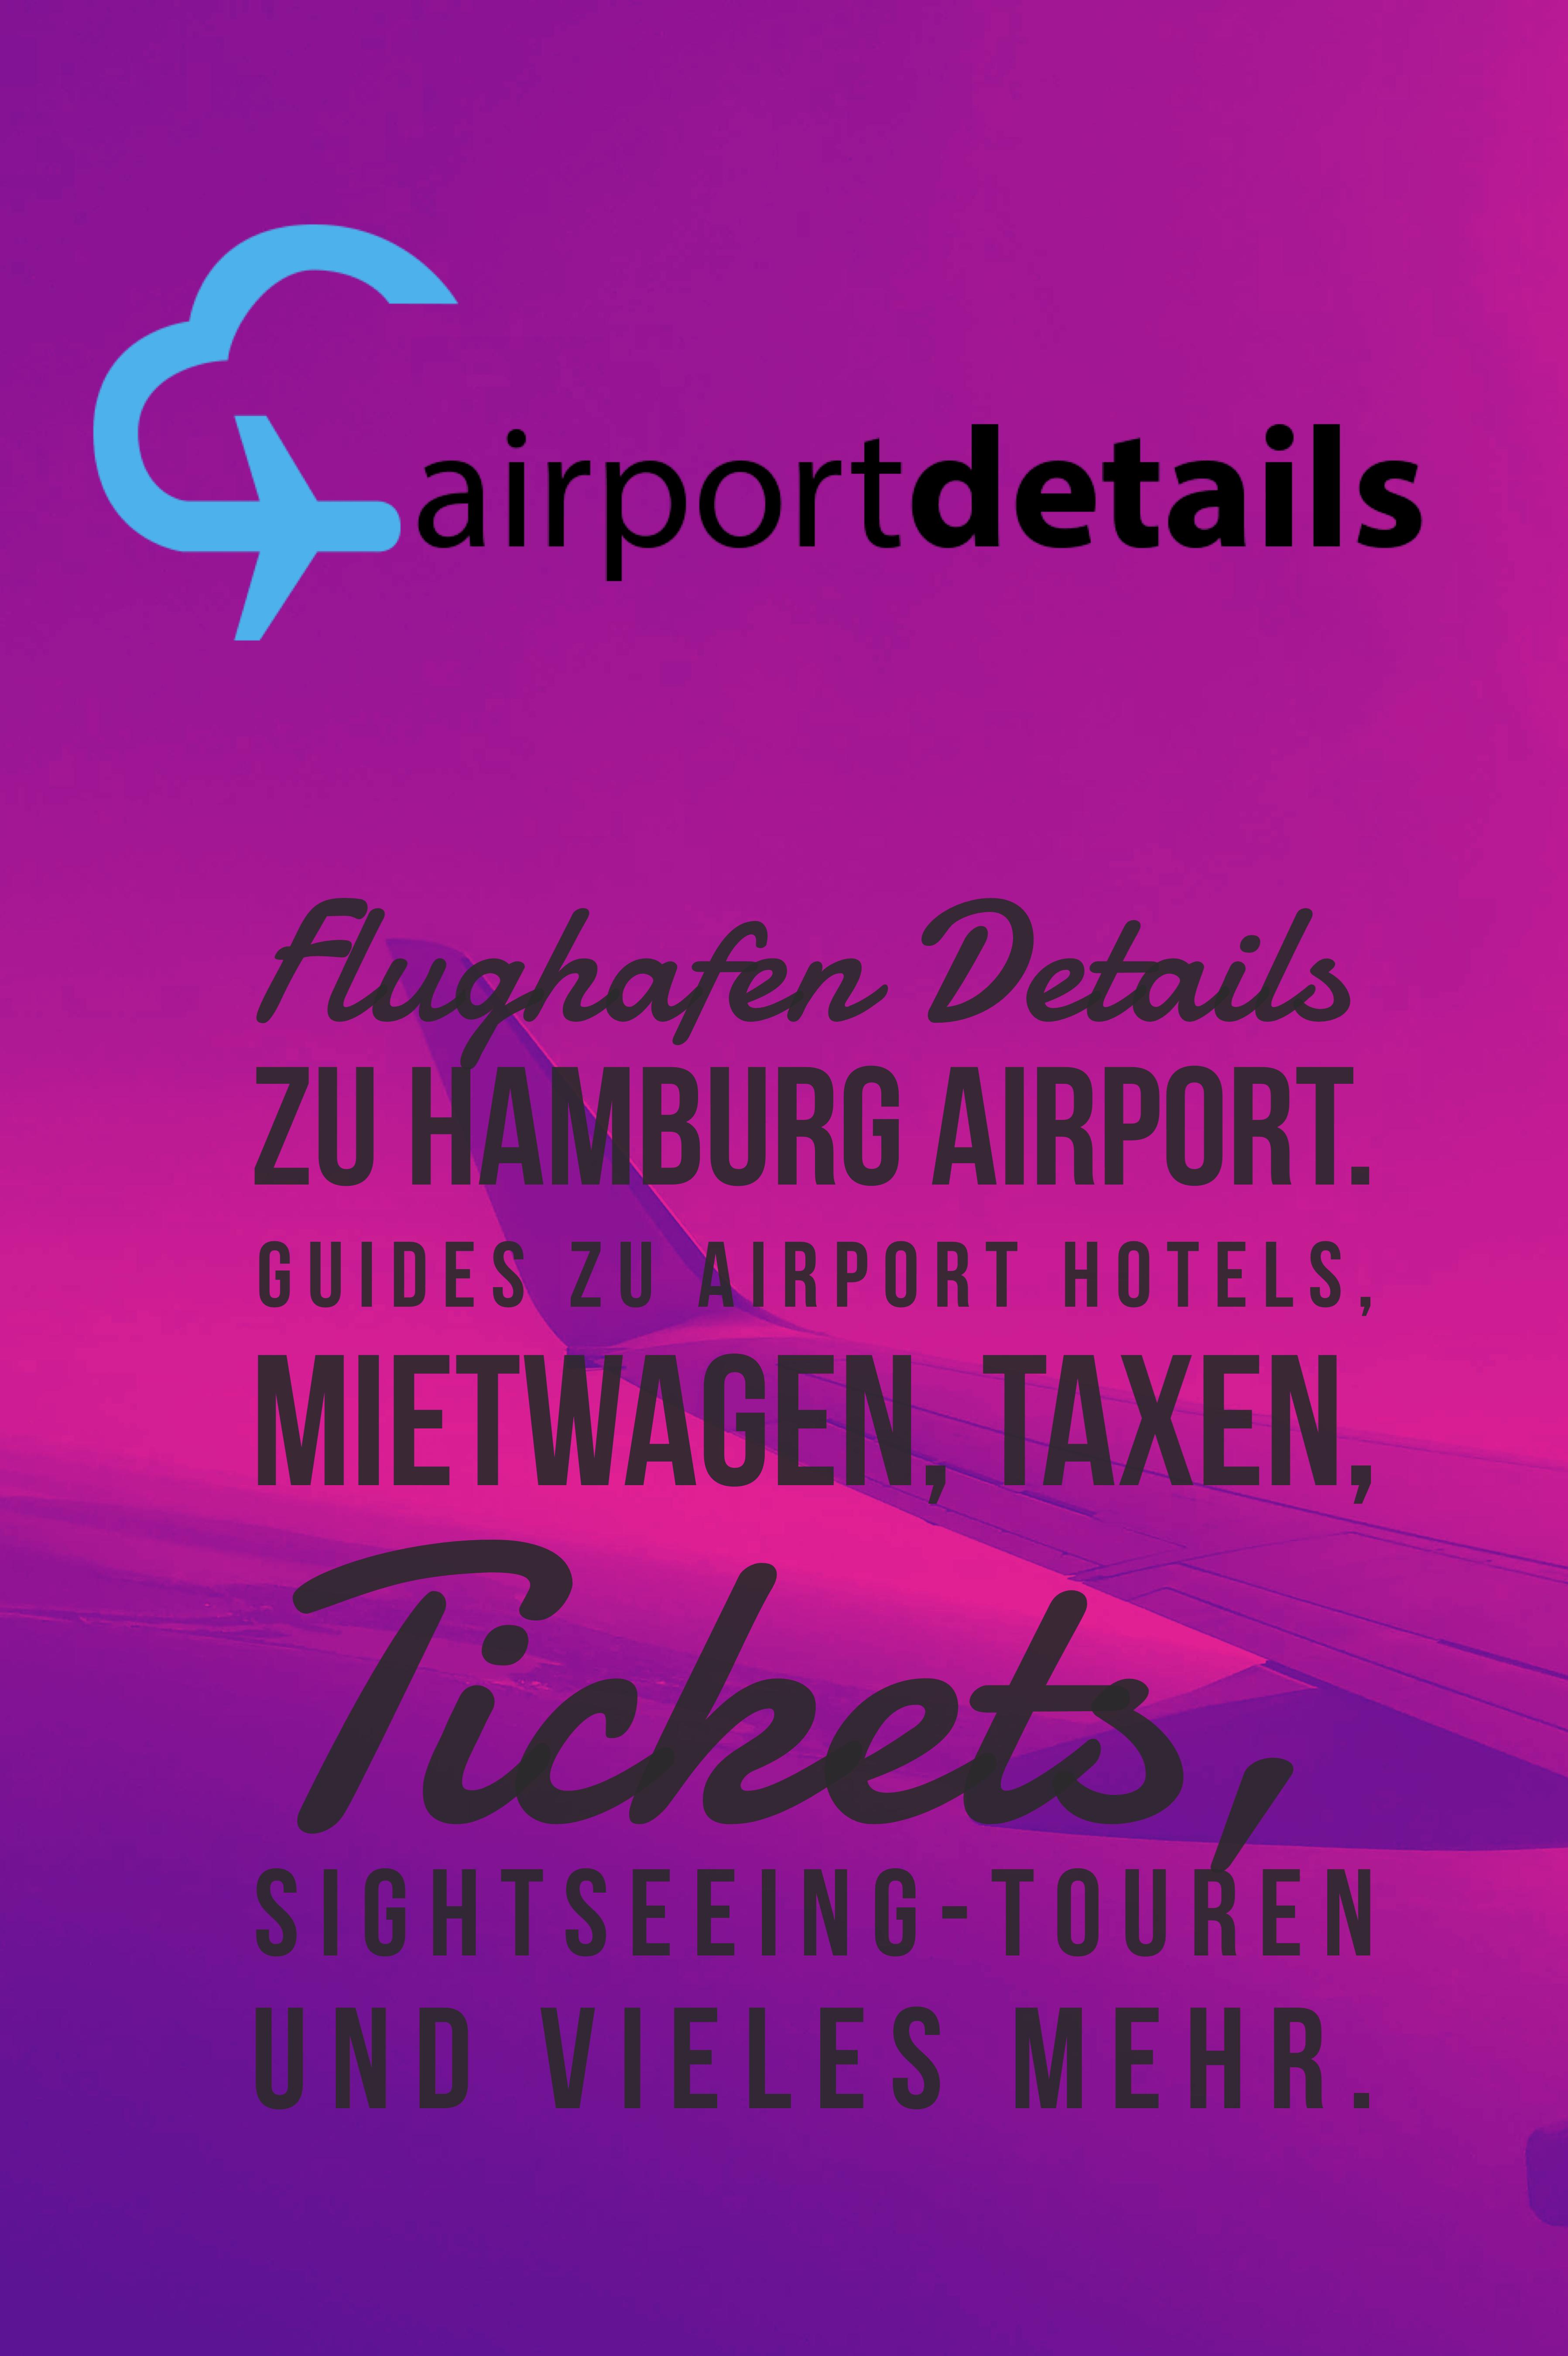 Hamburg Airport Flughafen hamburg, Hamburg, Flughafen